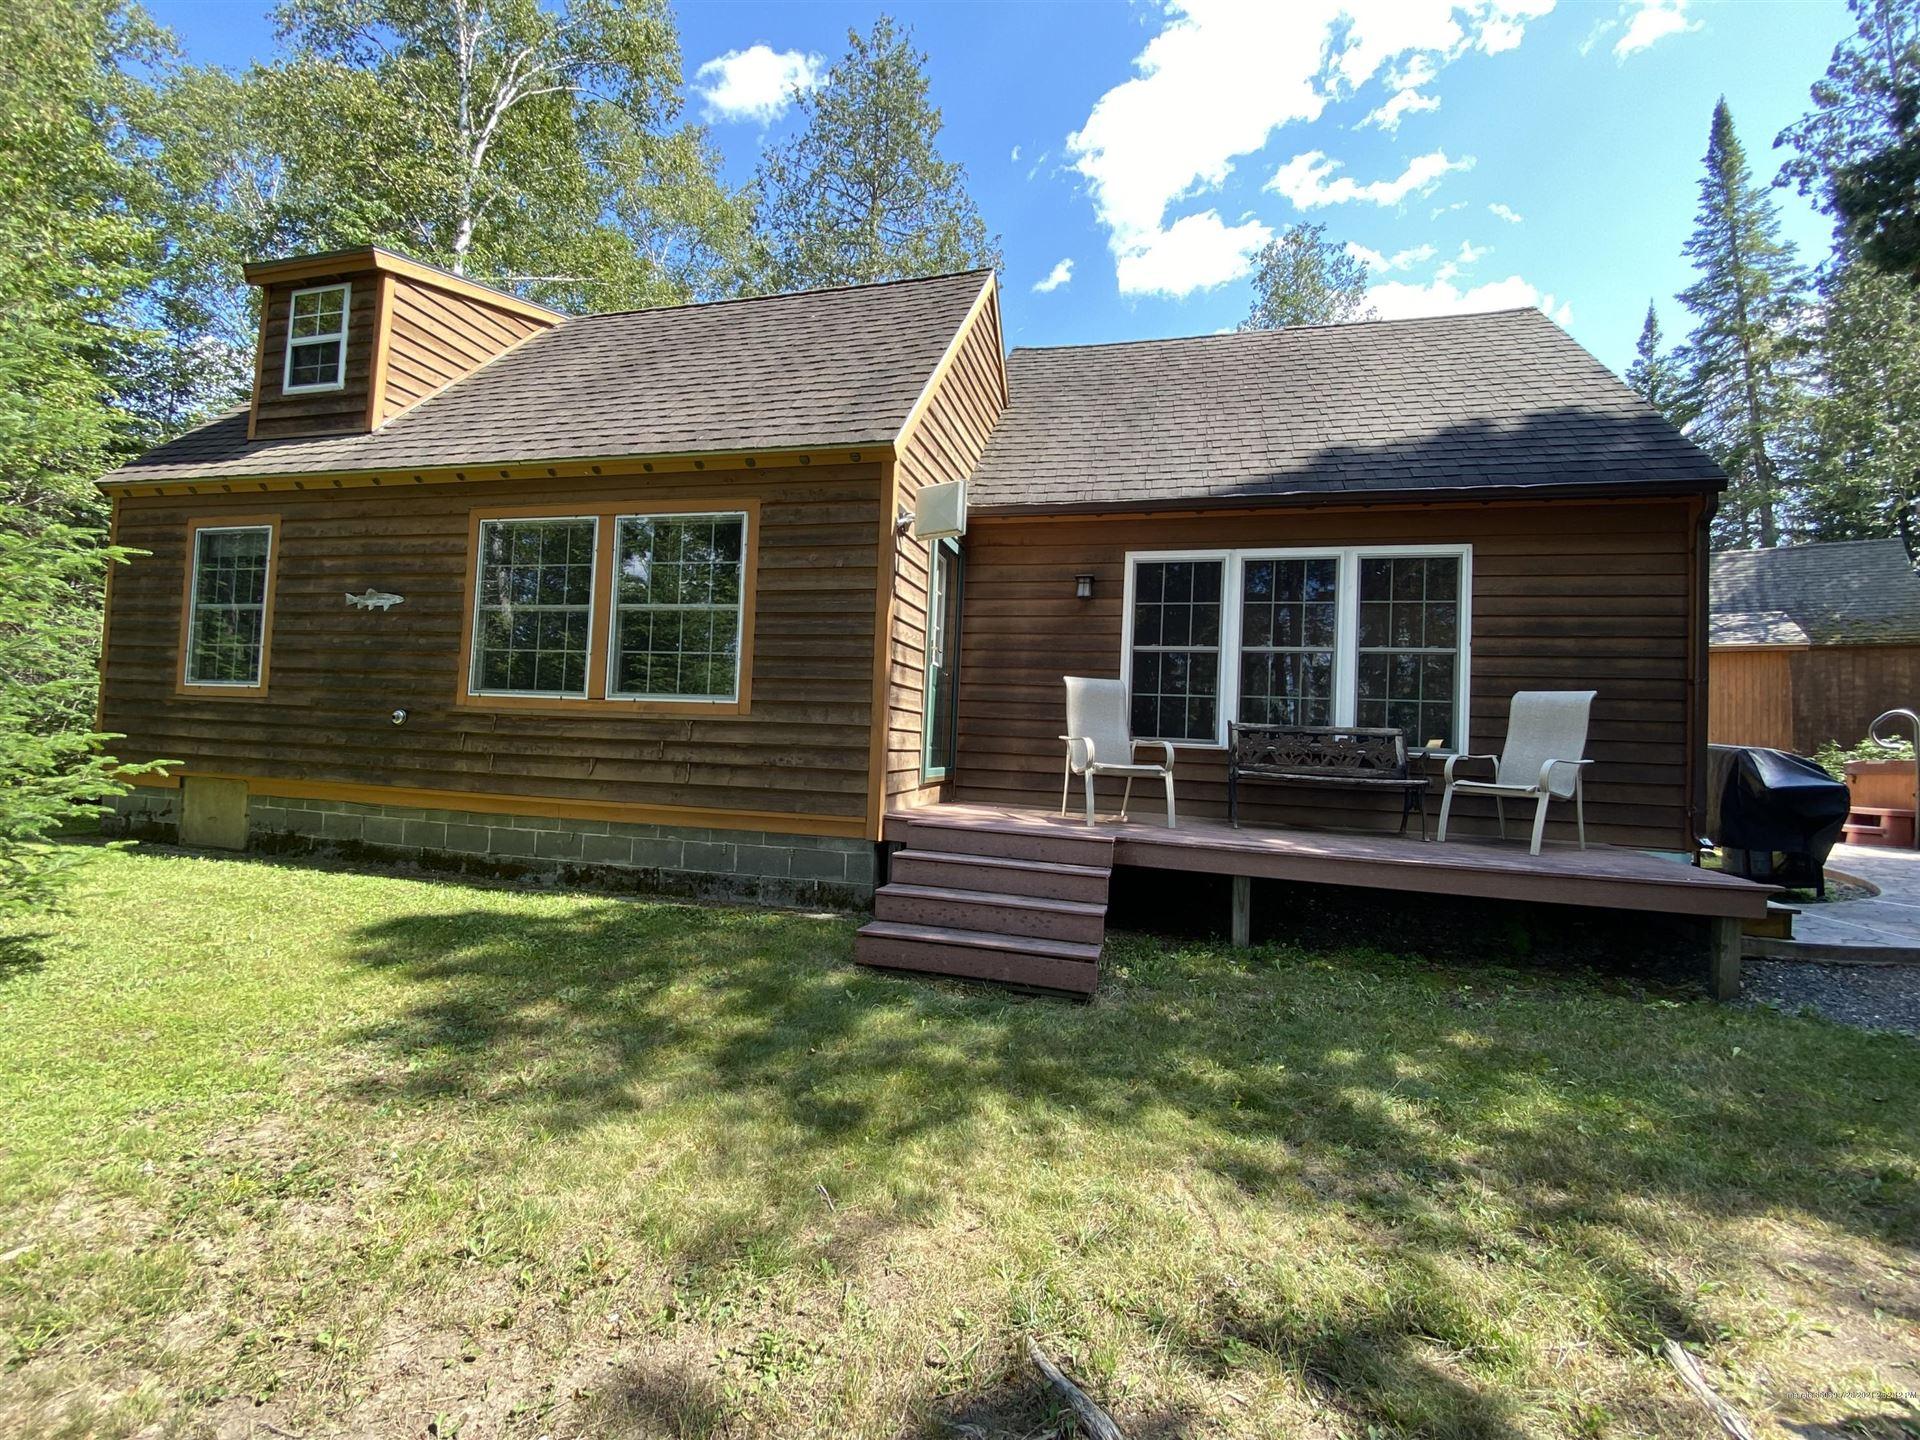 Photo of 451 Little Madawaska Lake Road, Westmanland, ME 04783 (MLS # 1502301)